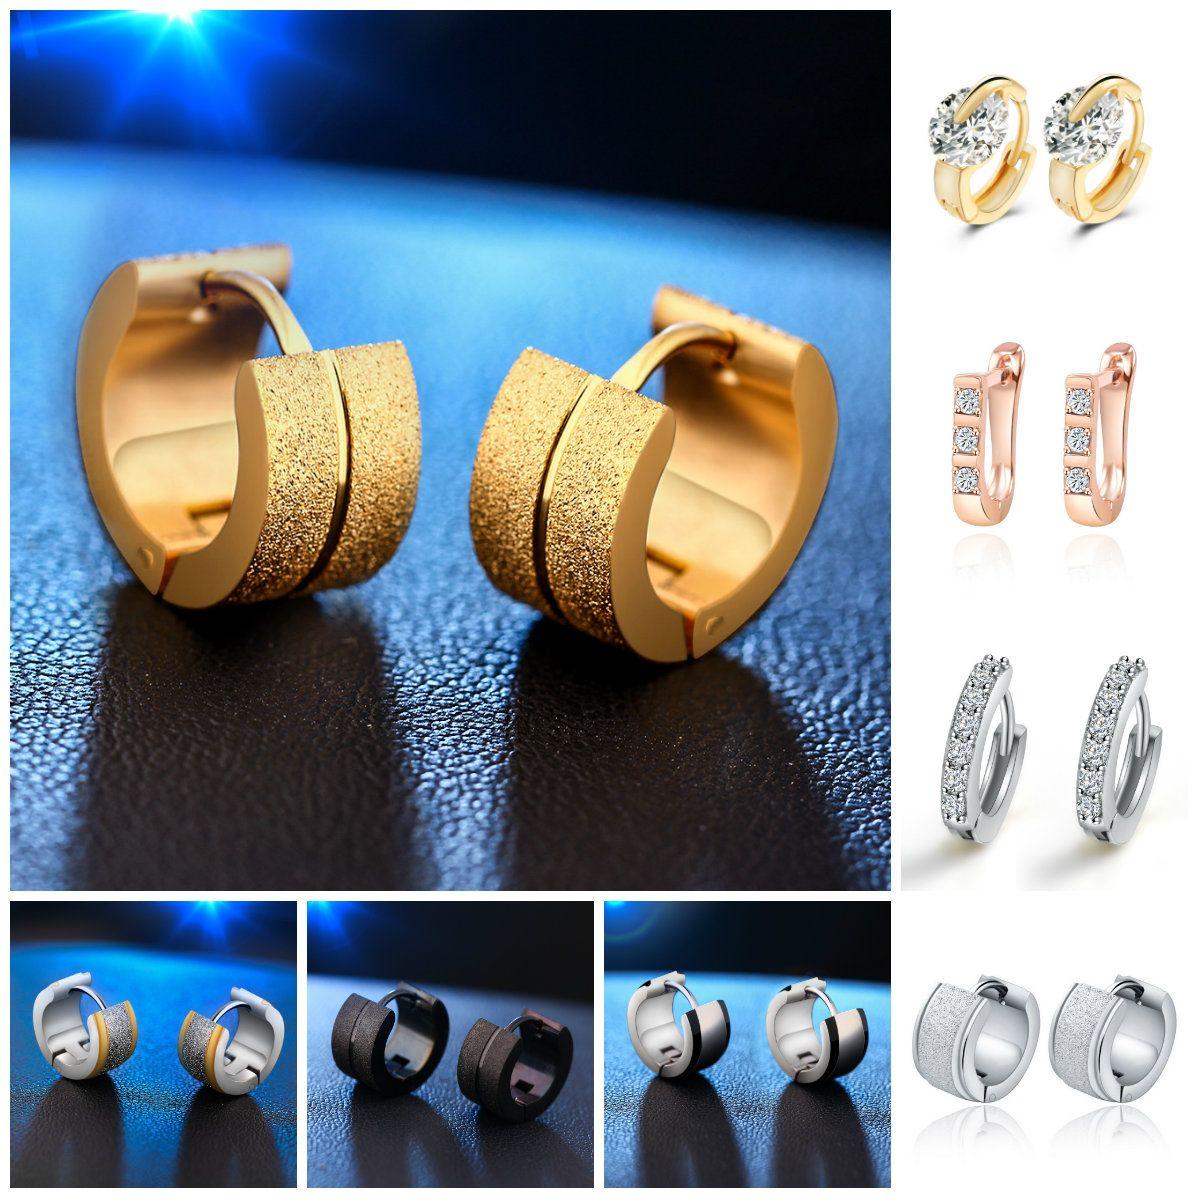 e6508c3f3 2019 Channel Earrings Hoop Mens Stainless Steel Stud Earrings For Women  Hanging Crystal Diamond Sterling Silver 14K Rose Gold Mens Hoop Earrings  From ...